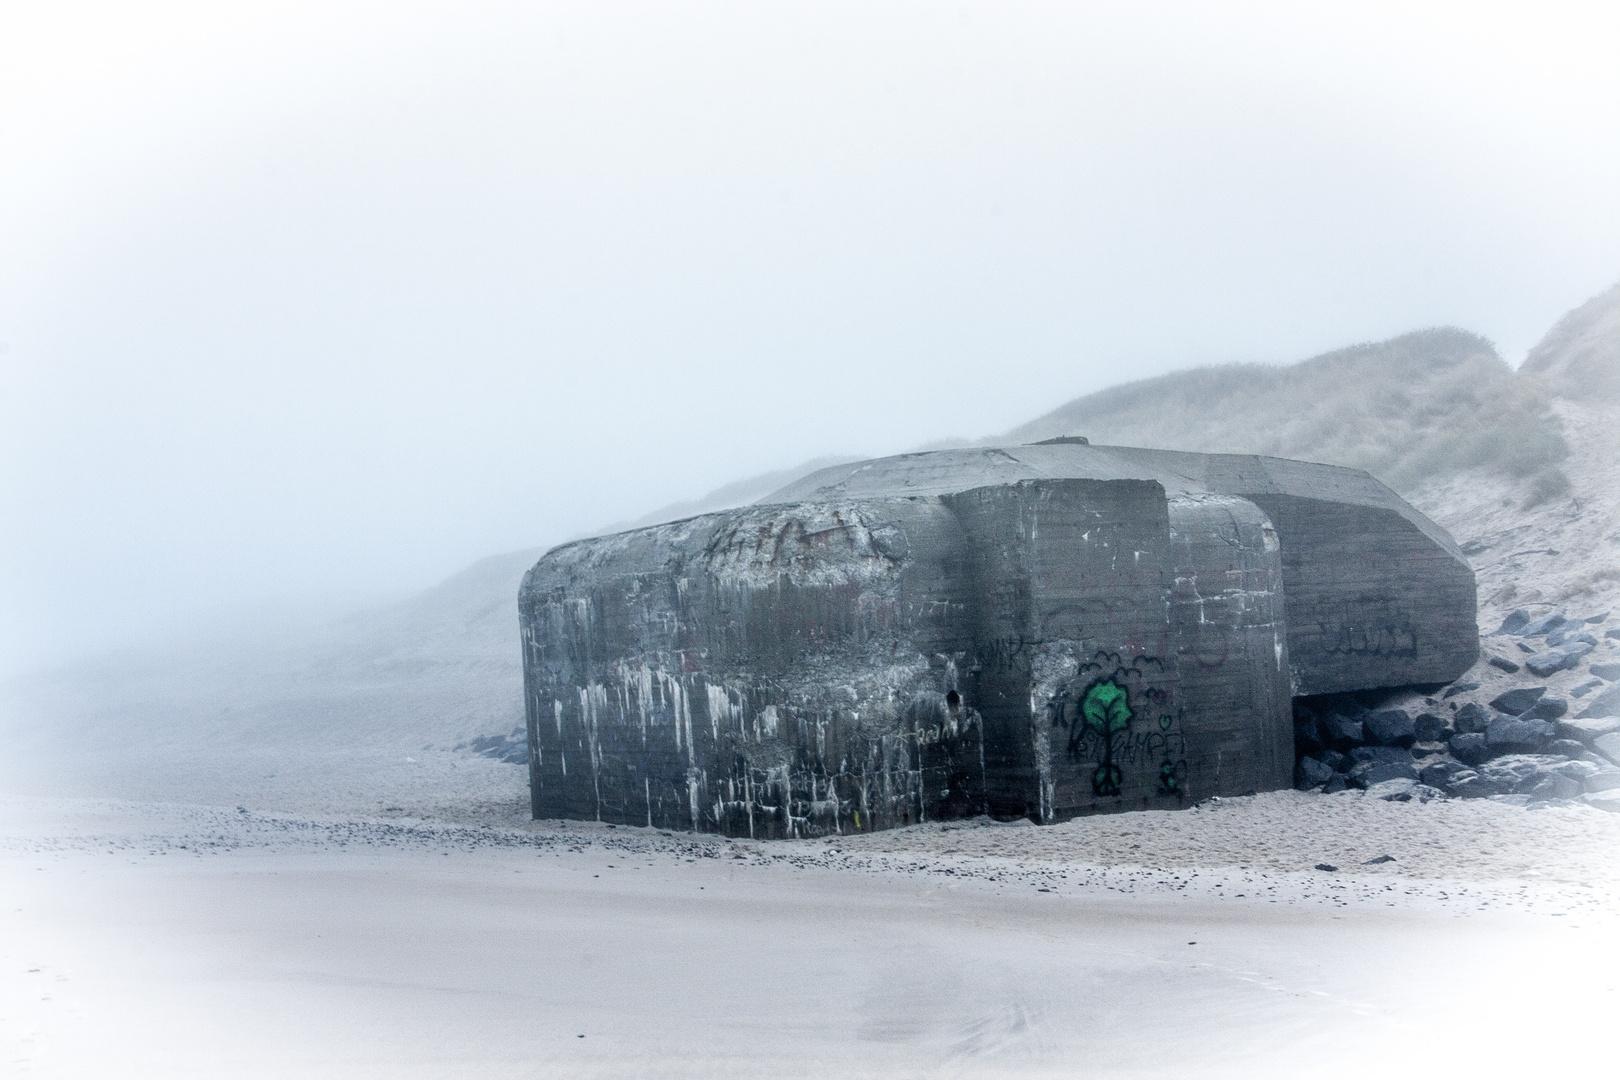 Bunker an der Nordsee in Dänemark